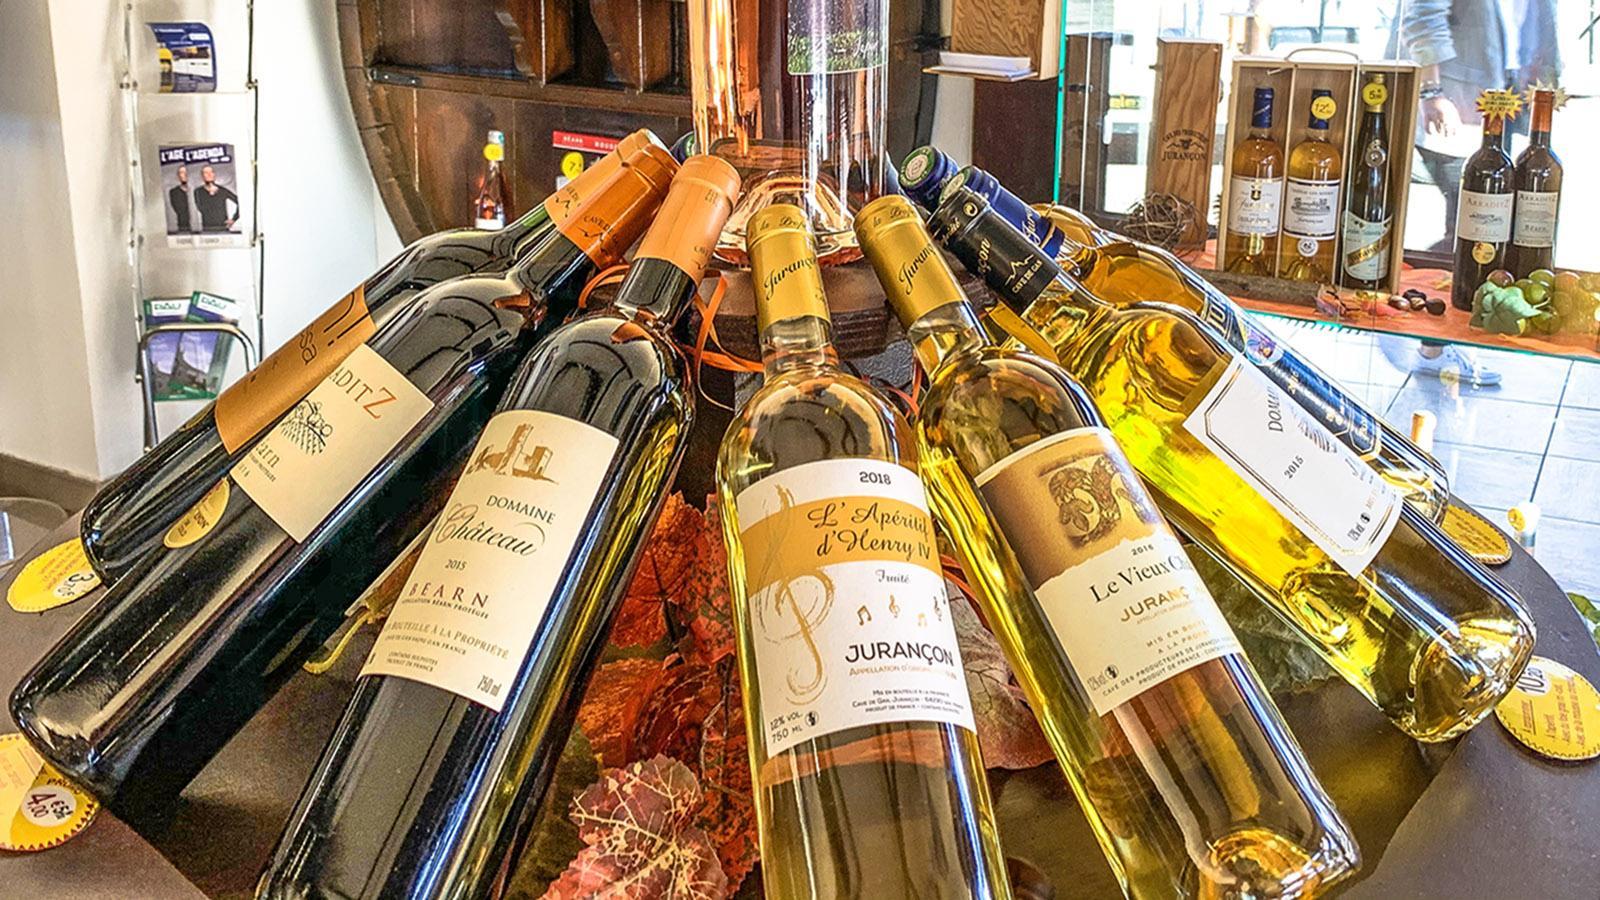 Pau: Weine aus dem Jurançon. Foto: Hilke Maunder